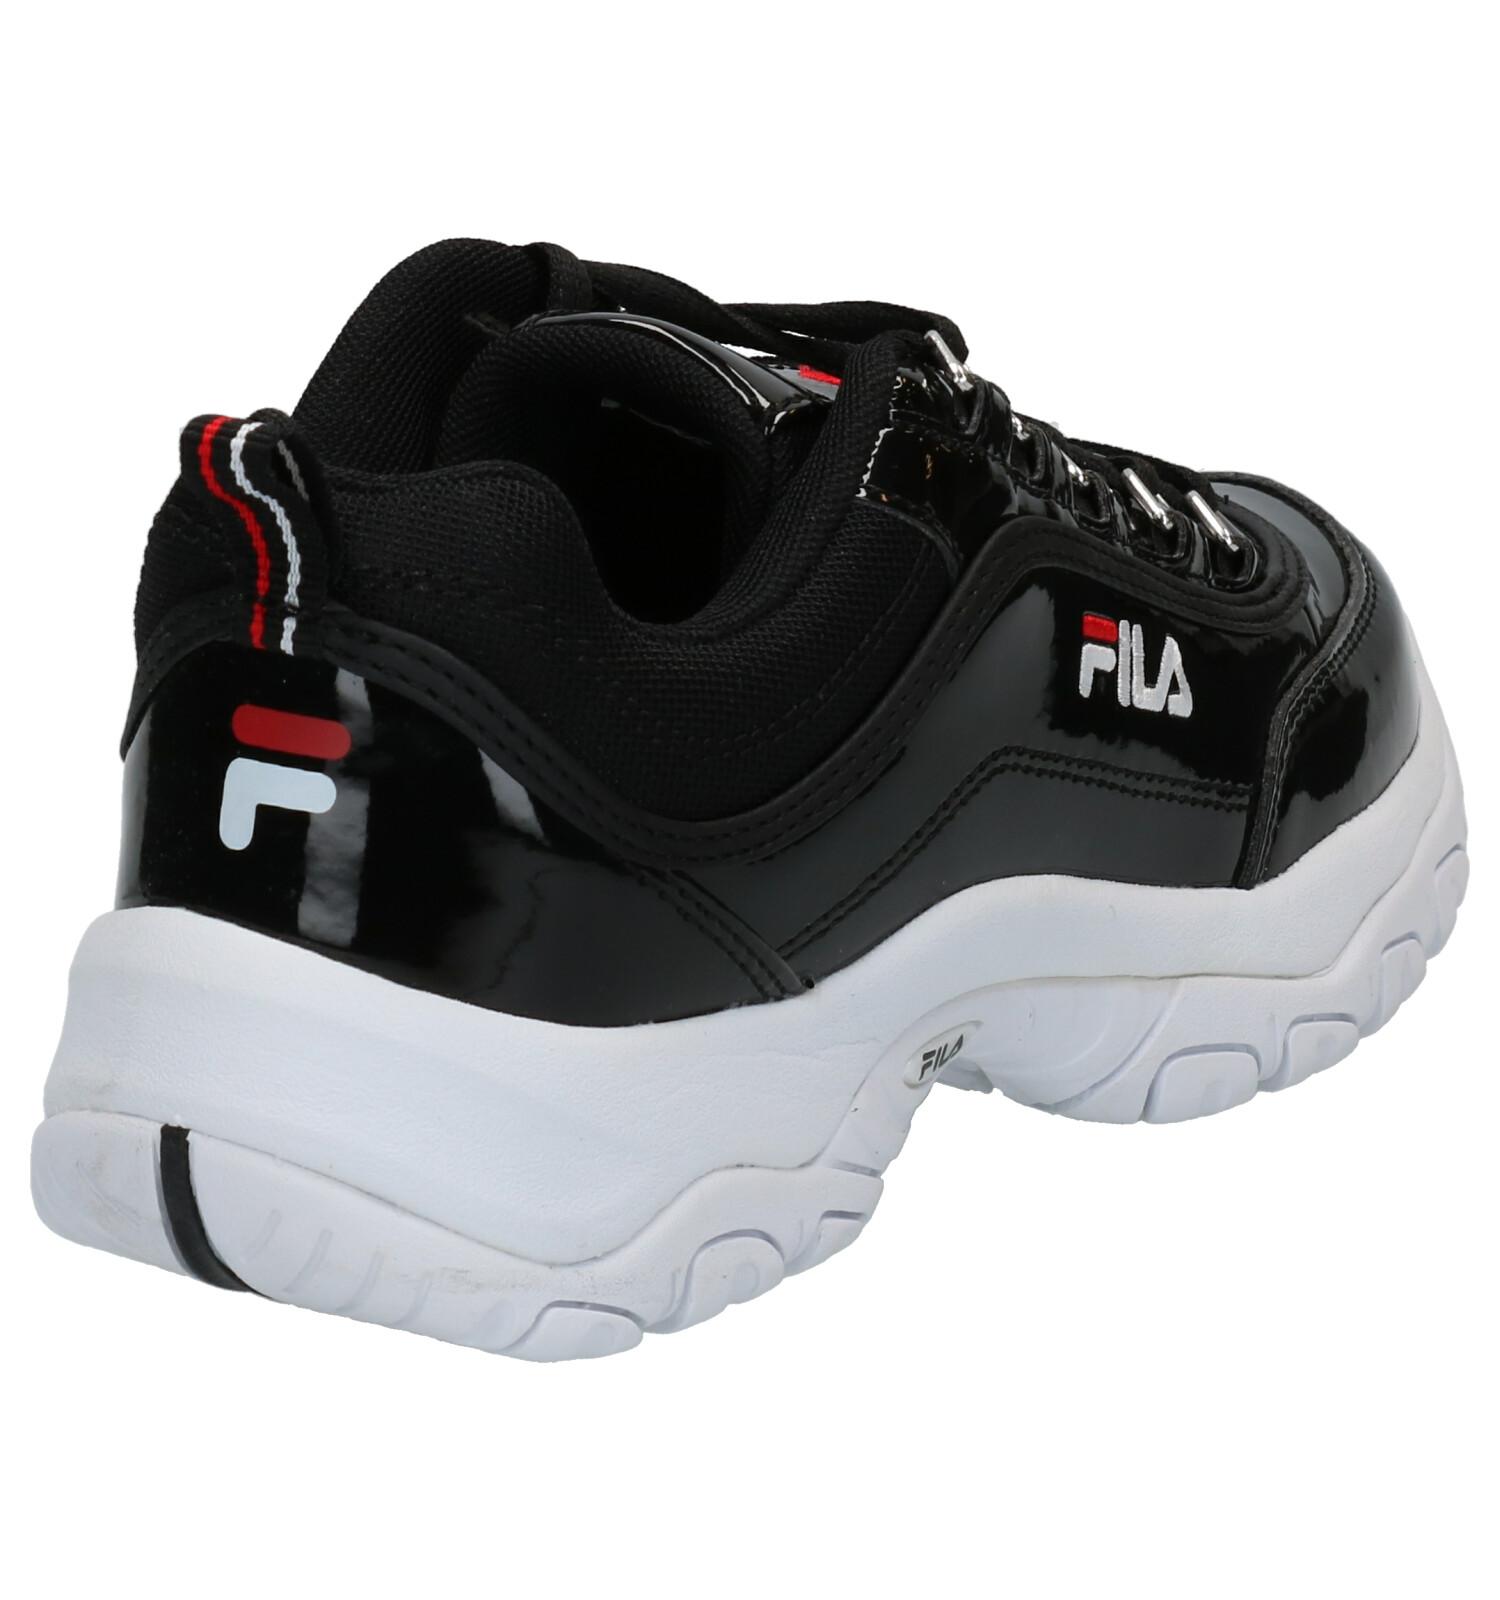 Fila Strada Zwarte Sneakers | SCHOENENTORFS.NL | Gratis